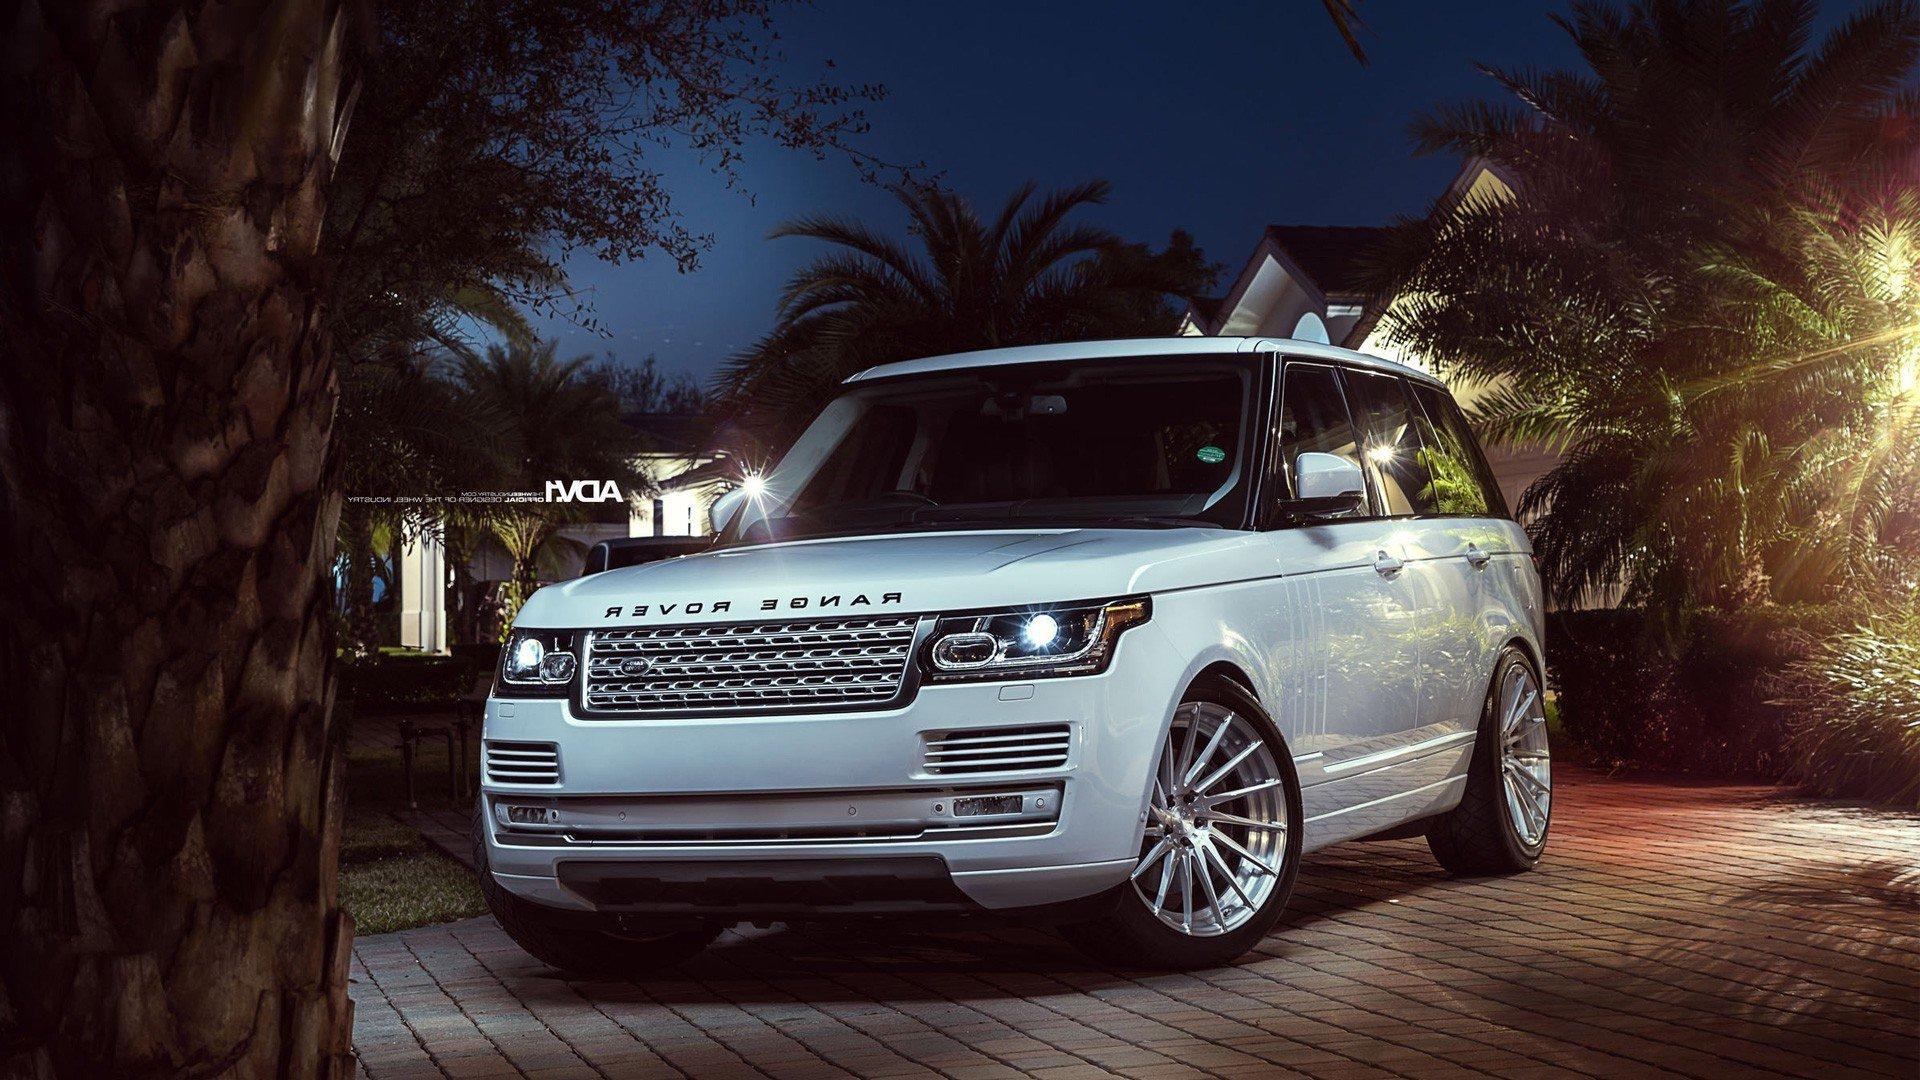 Range Rover Wallpaper Hd: 1920x1080 Range Rover Laptop Full HD 1080P HD 4k